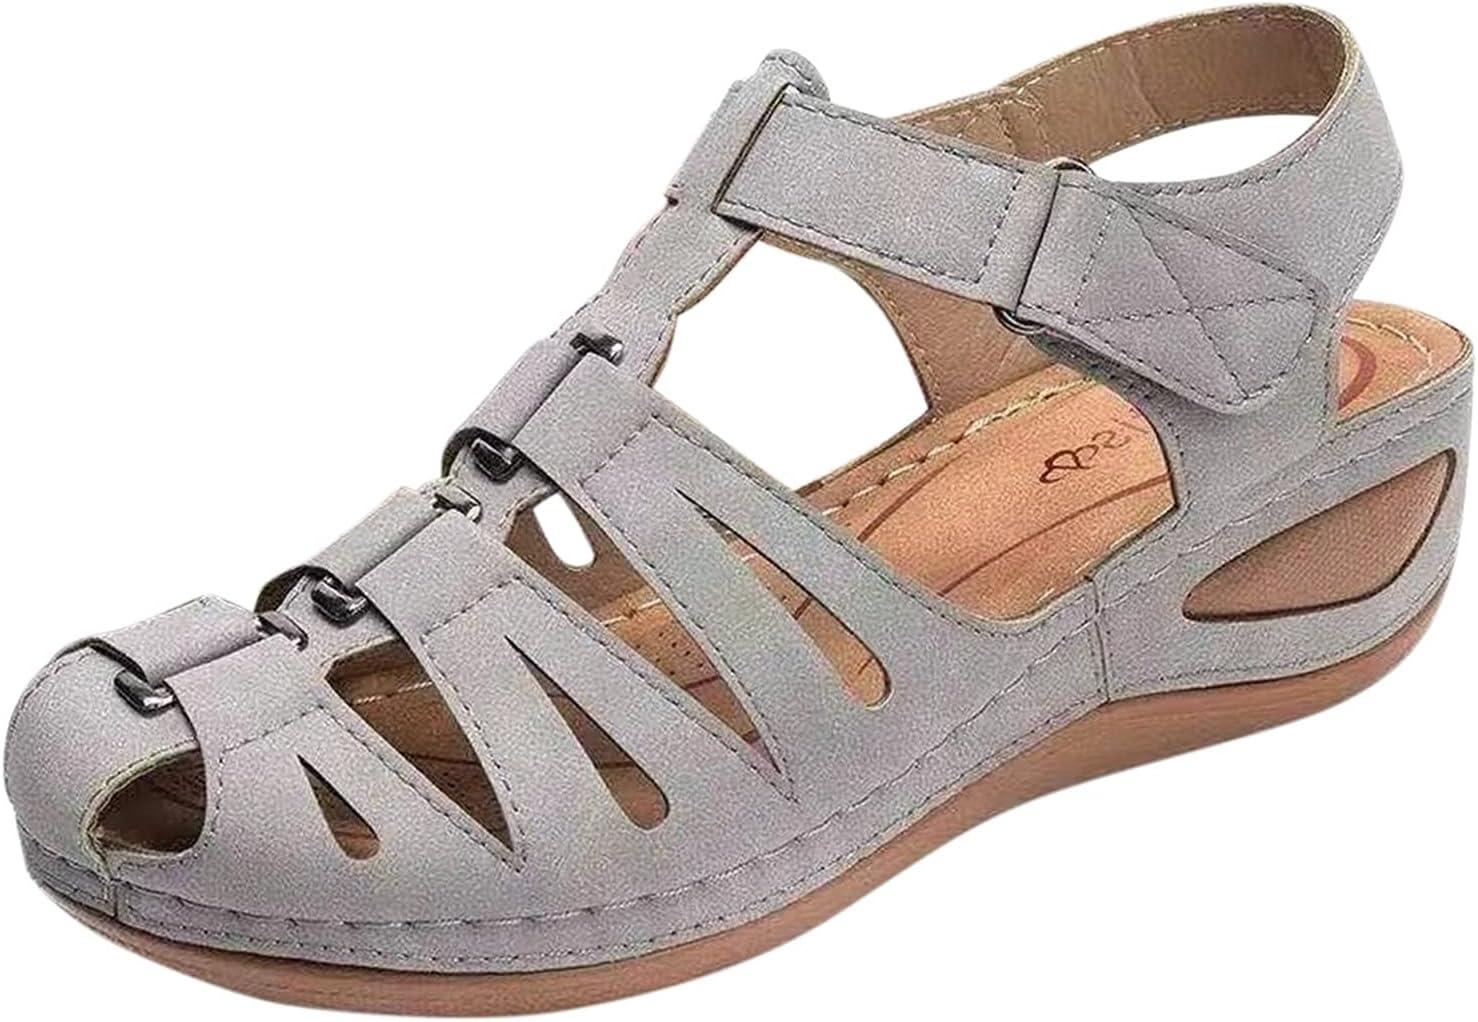 PLENTOP Roman Style Wedge Sandals Women's Solid Color Plus Miami Mall half Size